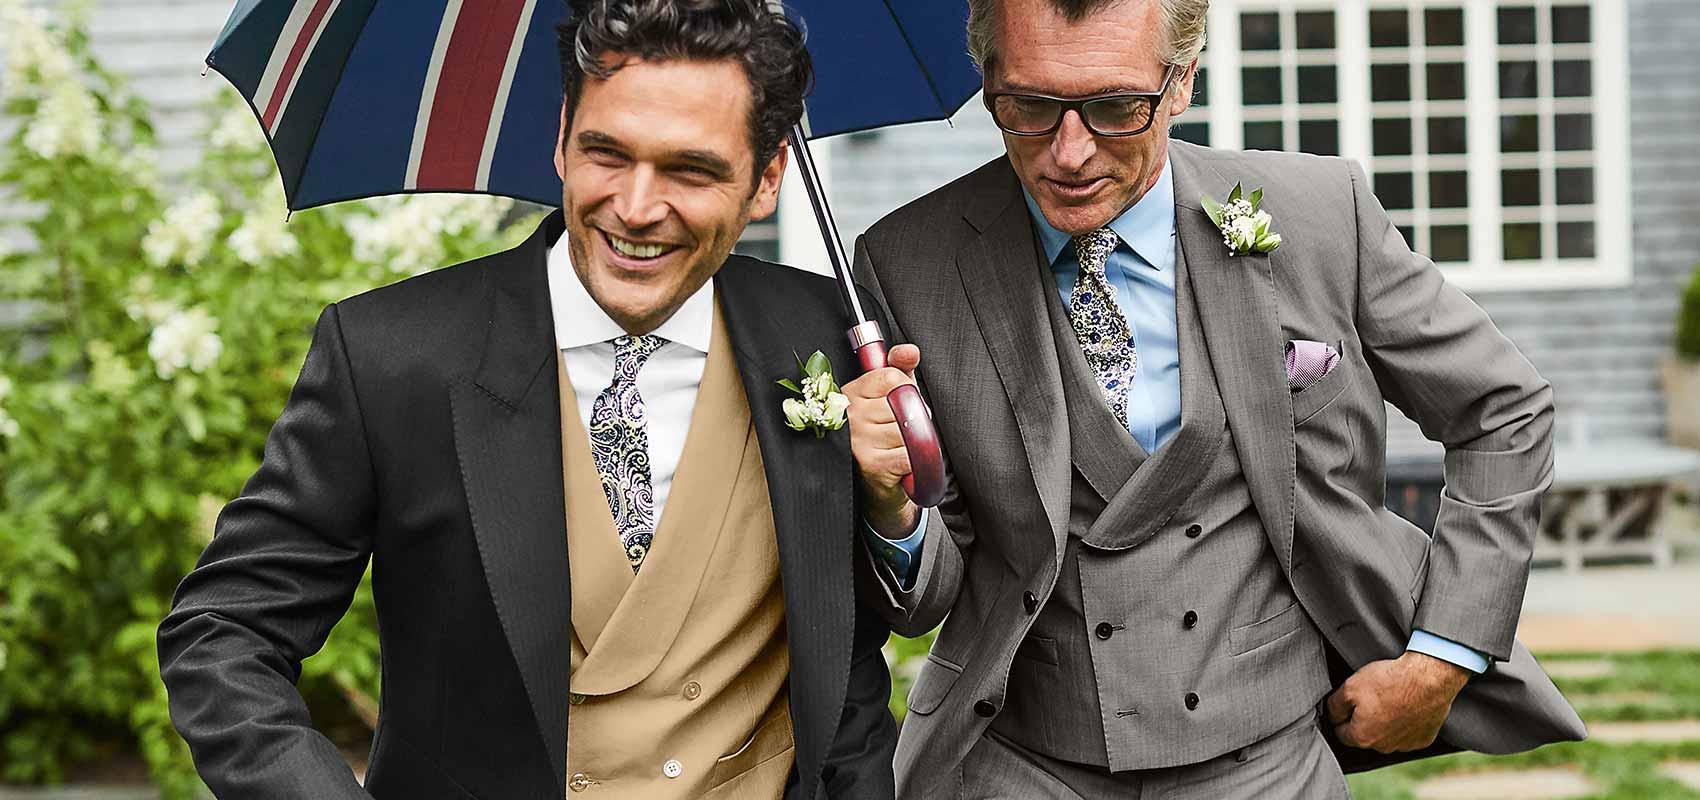 Charles Tyrwhitt three piece suits